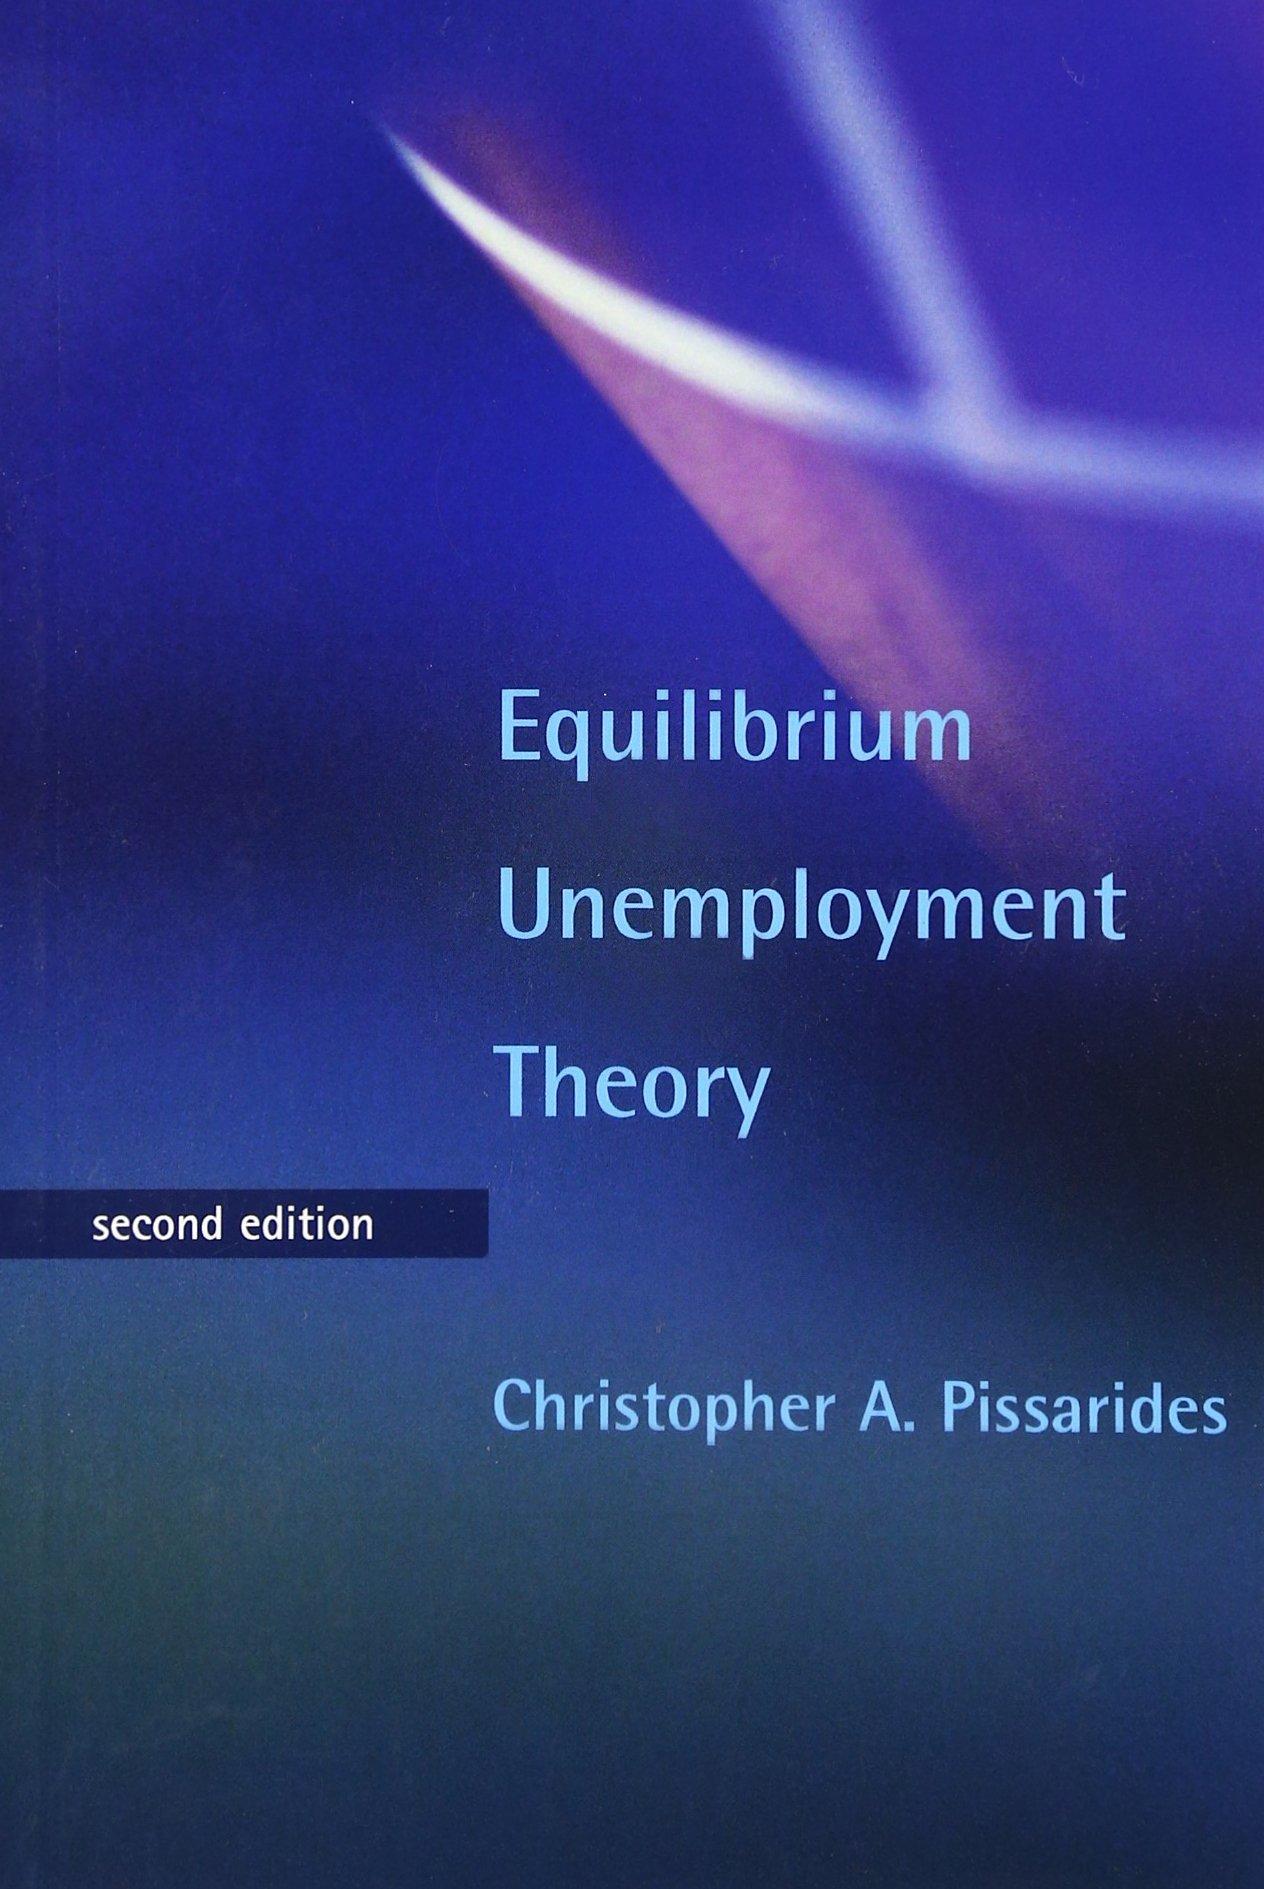 Equilibrium Unemployment Theory.